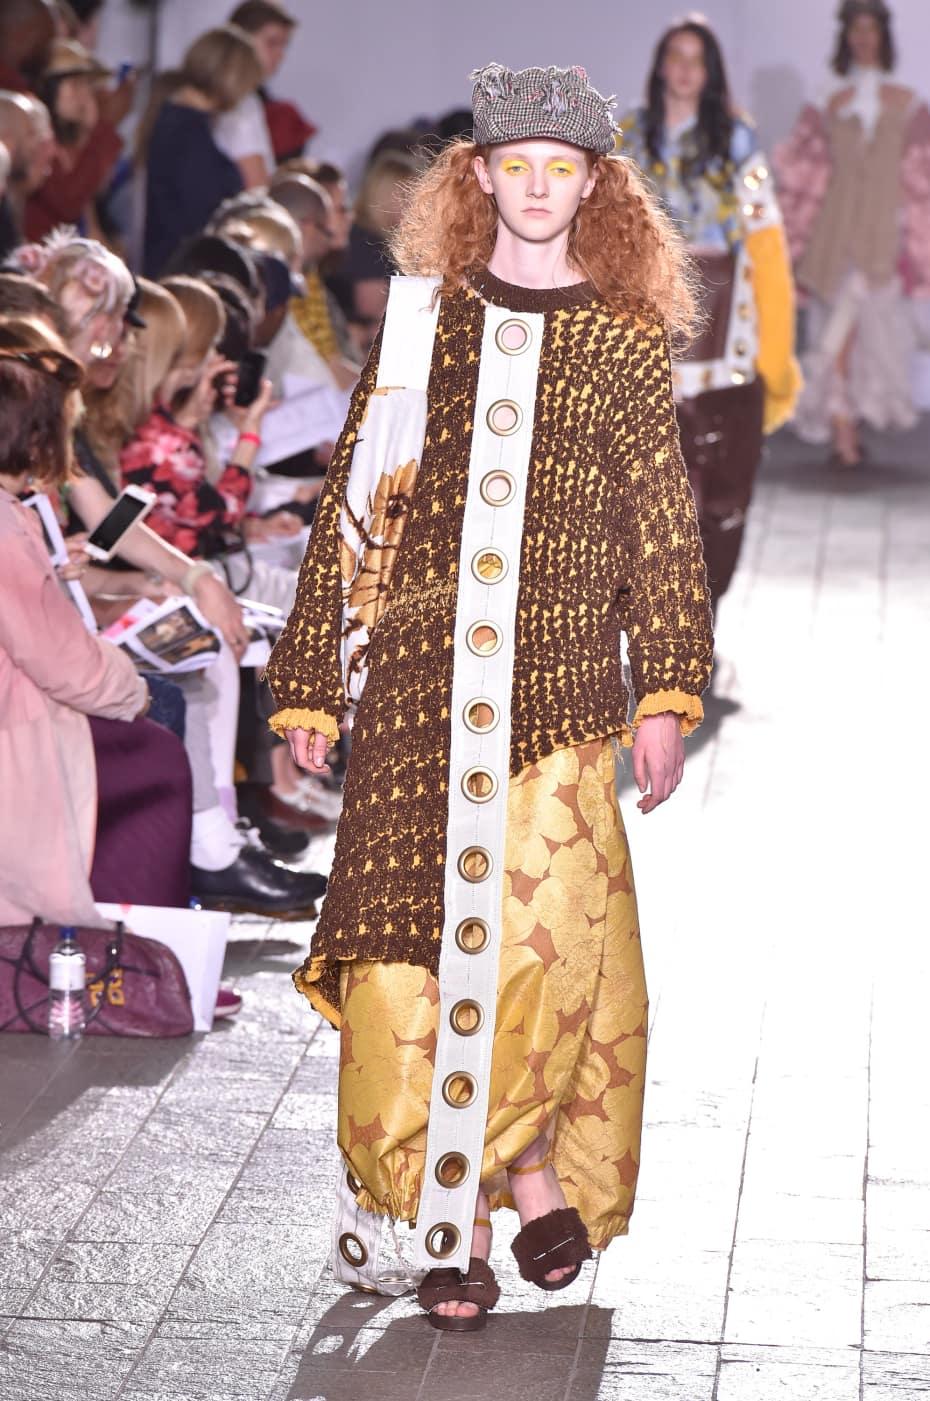 BA (Hons) Fashion: Fashion Design with Knitwear - Central ...